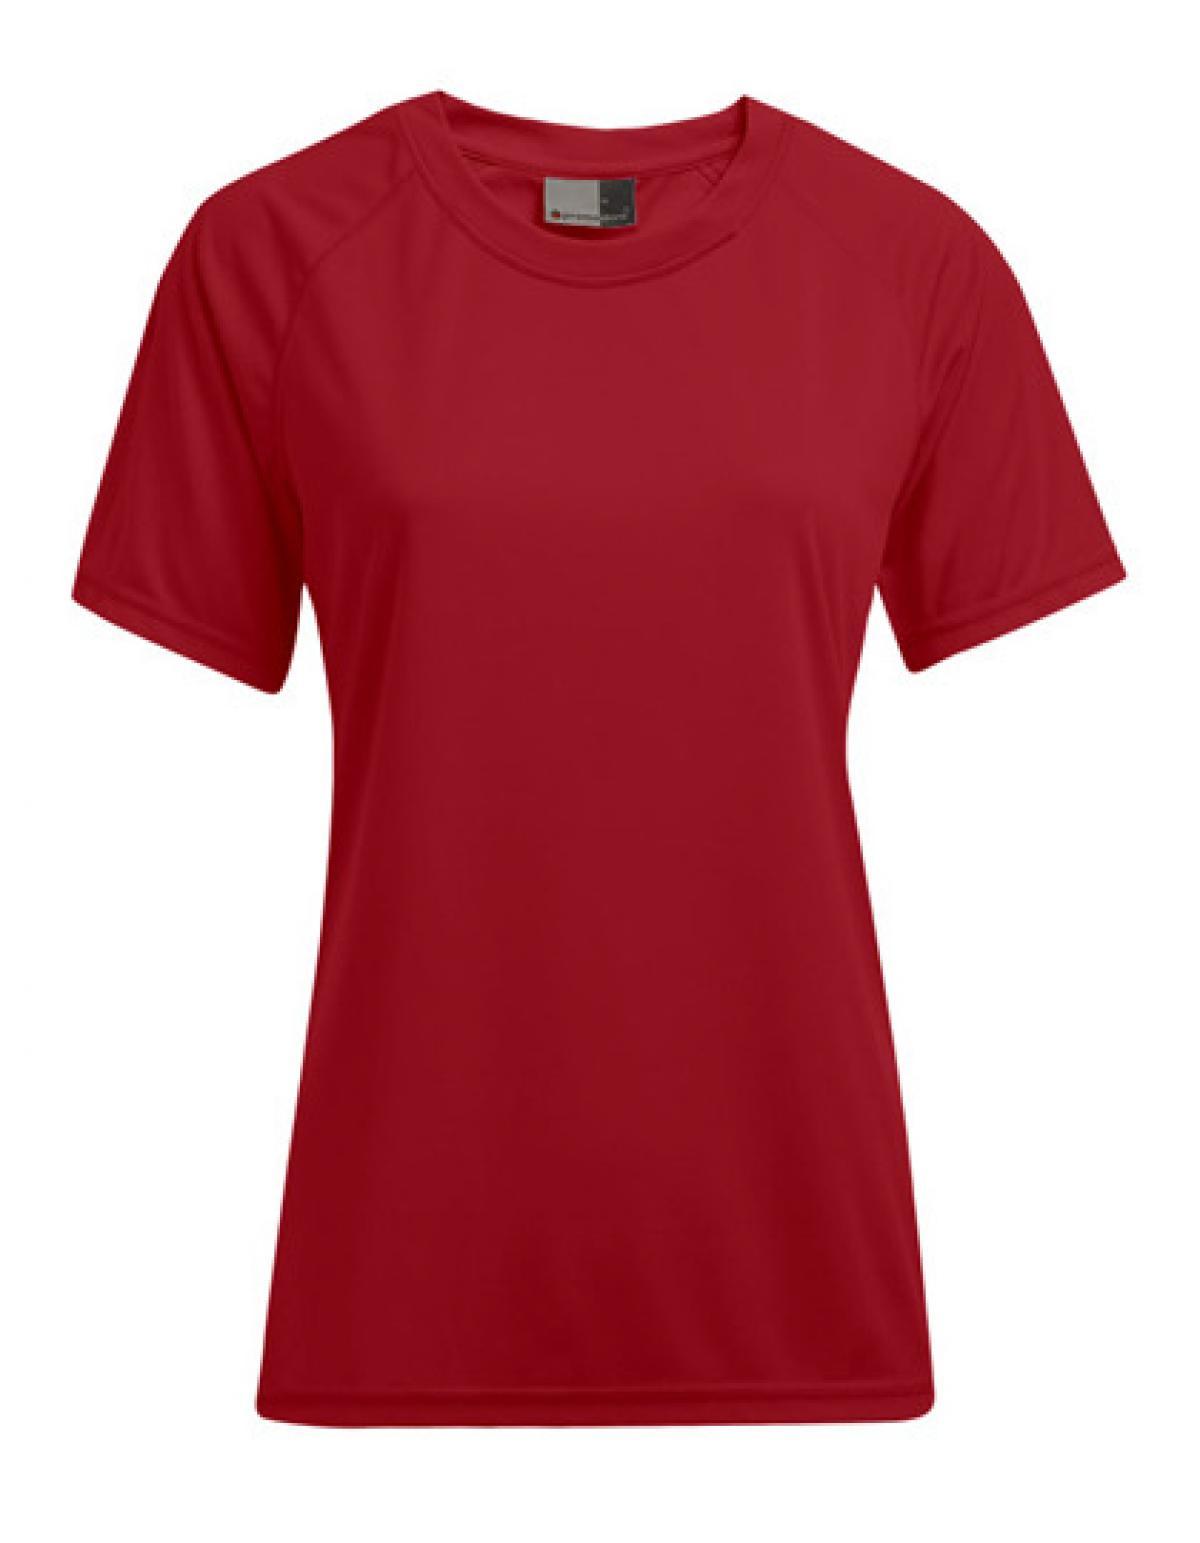 damen sport t shirt schwei absorbierend rexlander s. Black Bedroom Furniture Sets. Home Design Ideas